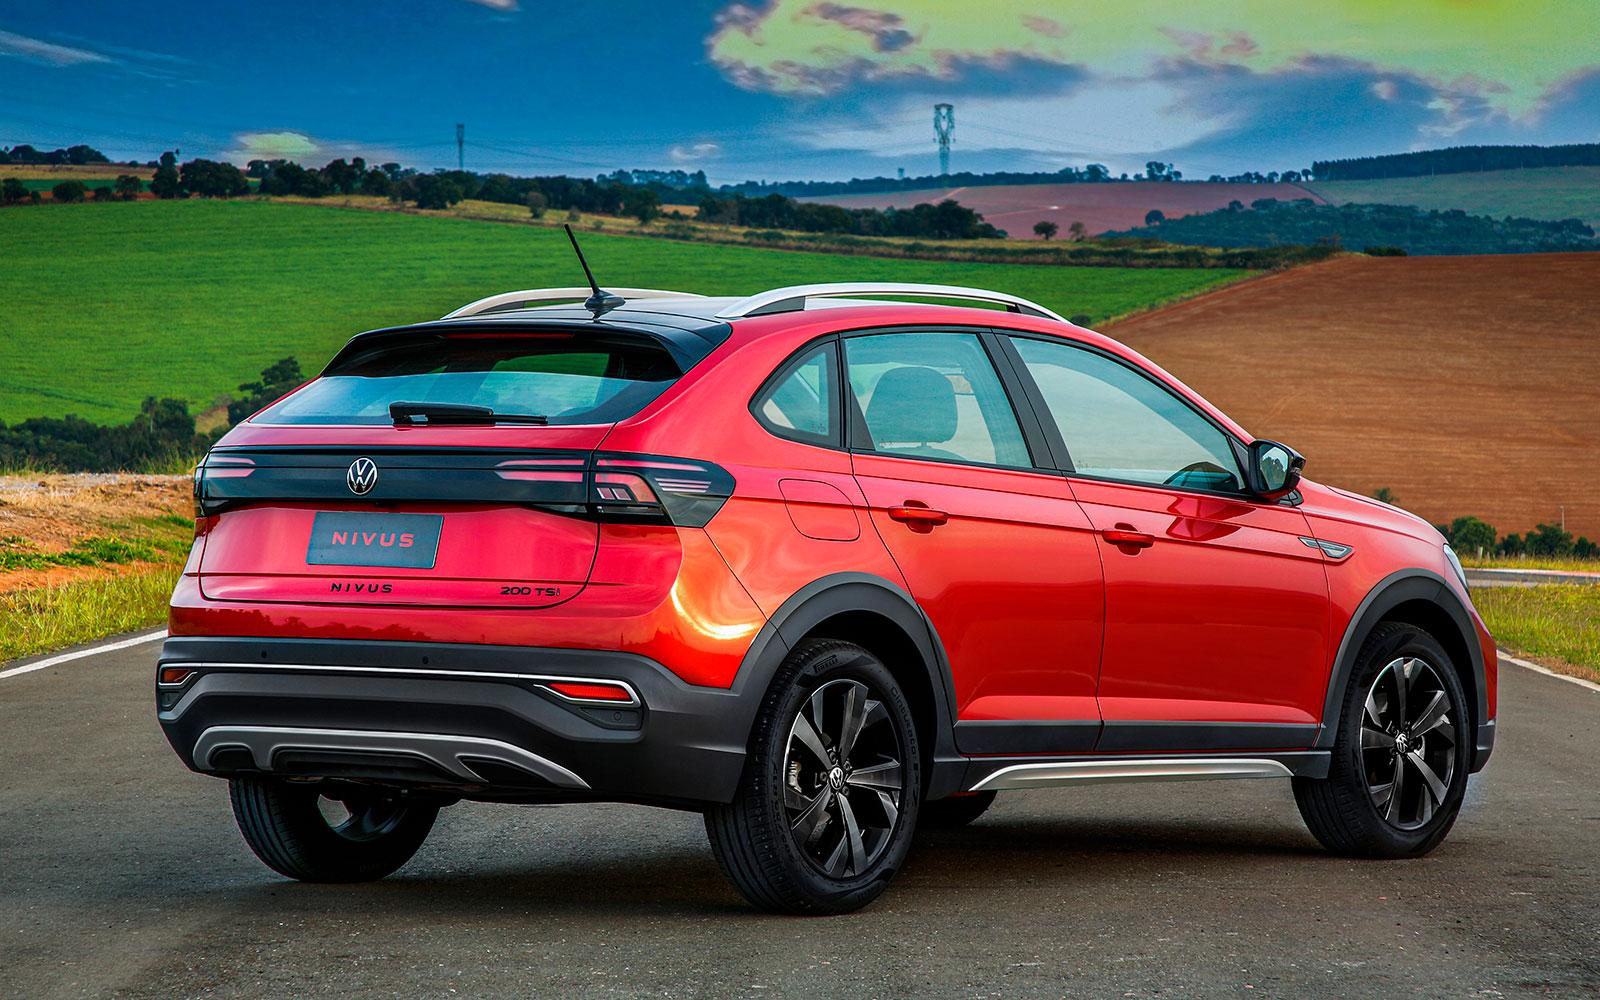 Volkswagen Nivus выйдет на европейский рынок 2